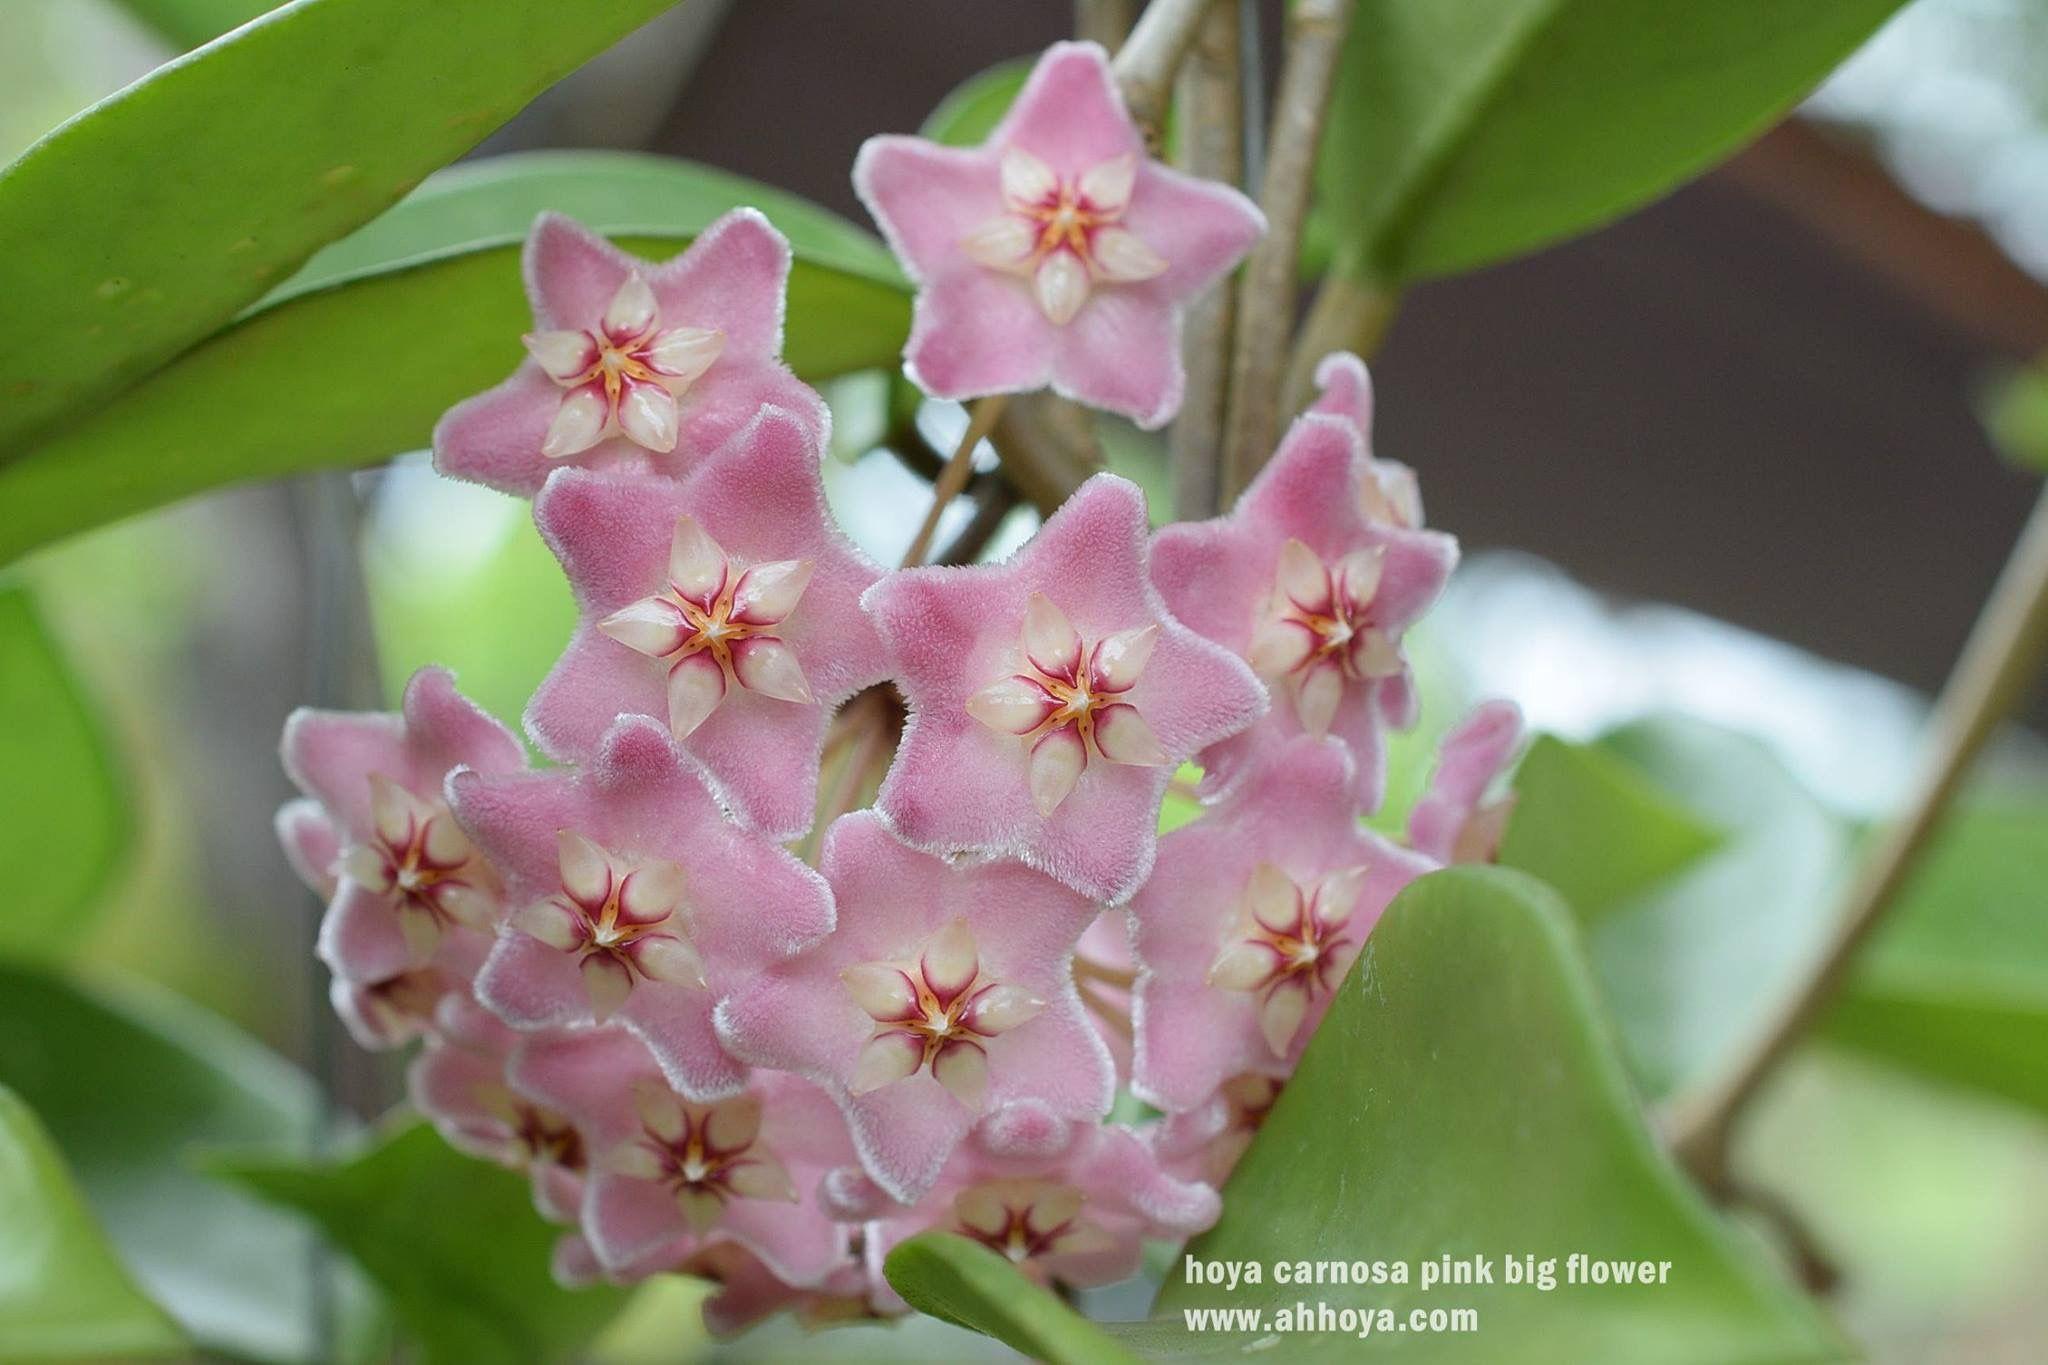 Hoya Carnosa Pink Big Flower Hoya Pinterest Big Flowers